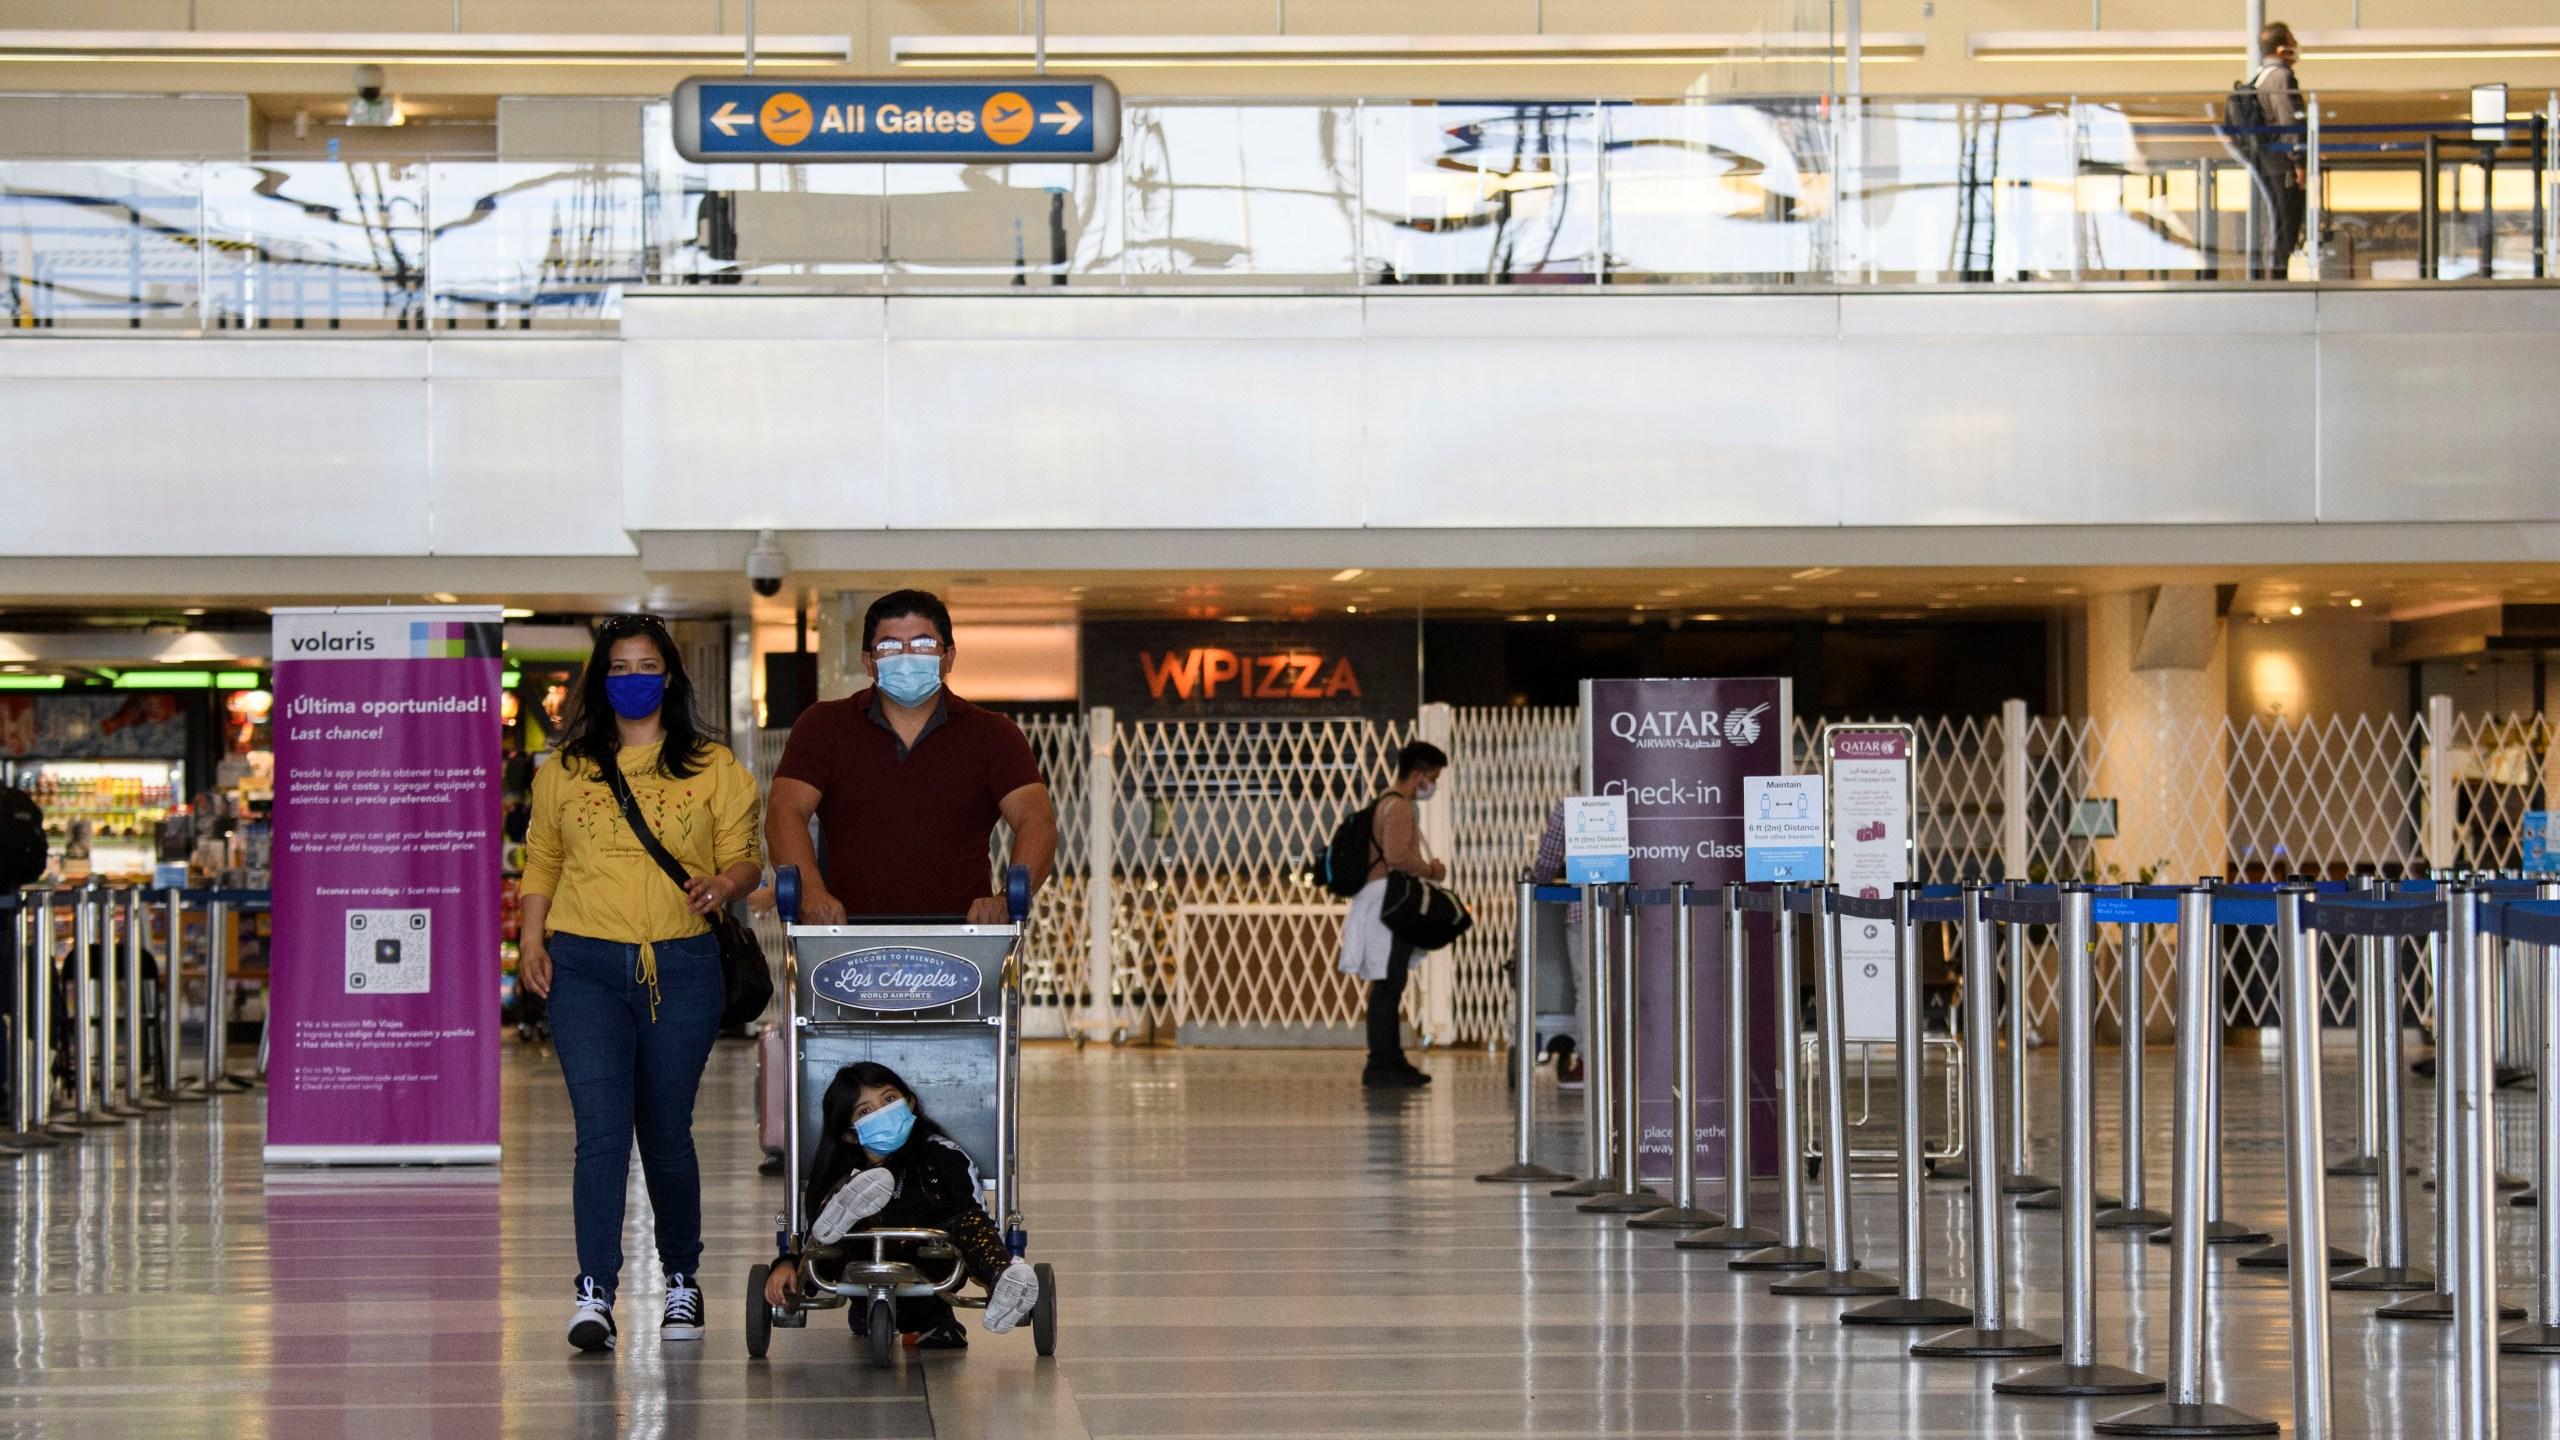 Travelers walk past flight check-in counters inside the Tom Bradley international Terminal at Los Angeles International Airport (LAX) in Los Angeles, California, Nov. 18, 2020. (PATRICK FALLON/AFP via Getty Images)